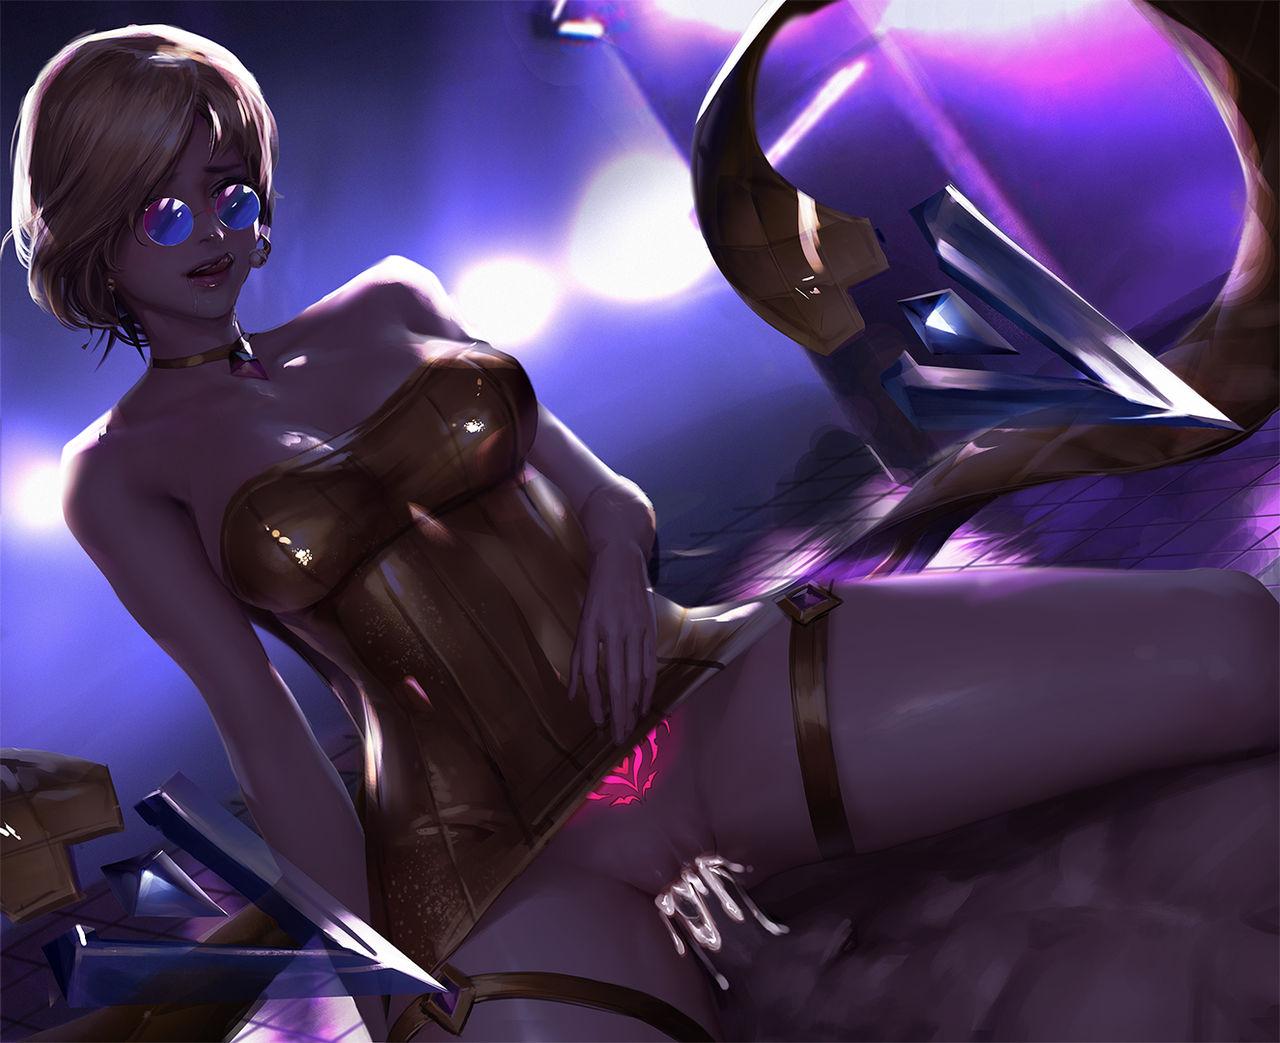 sword riven prestige valiant edition Mortal kombat female characters nude